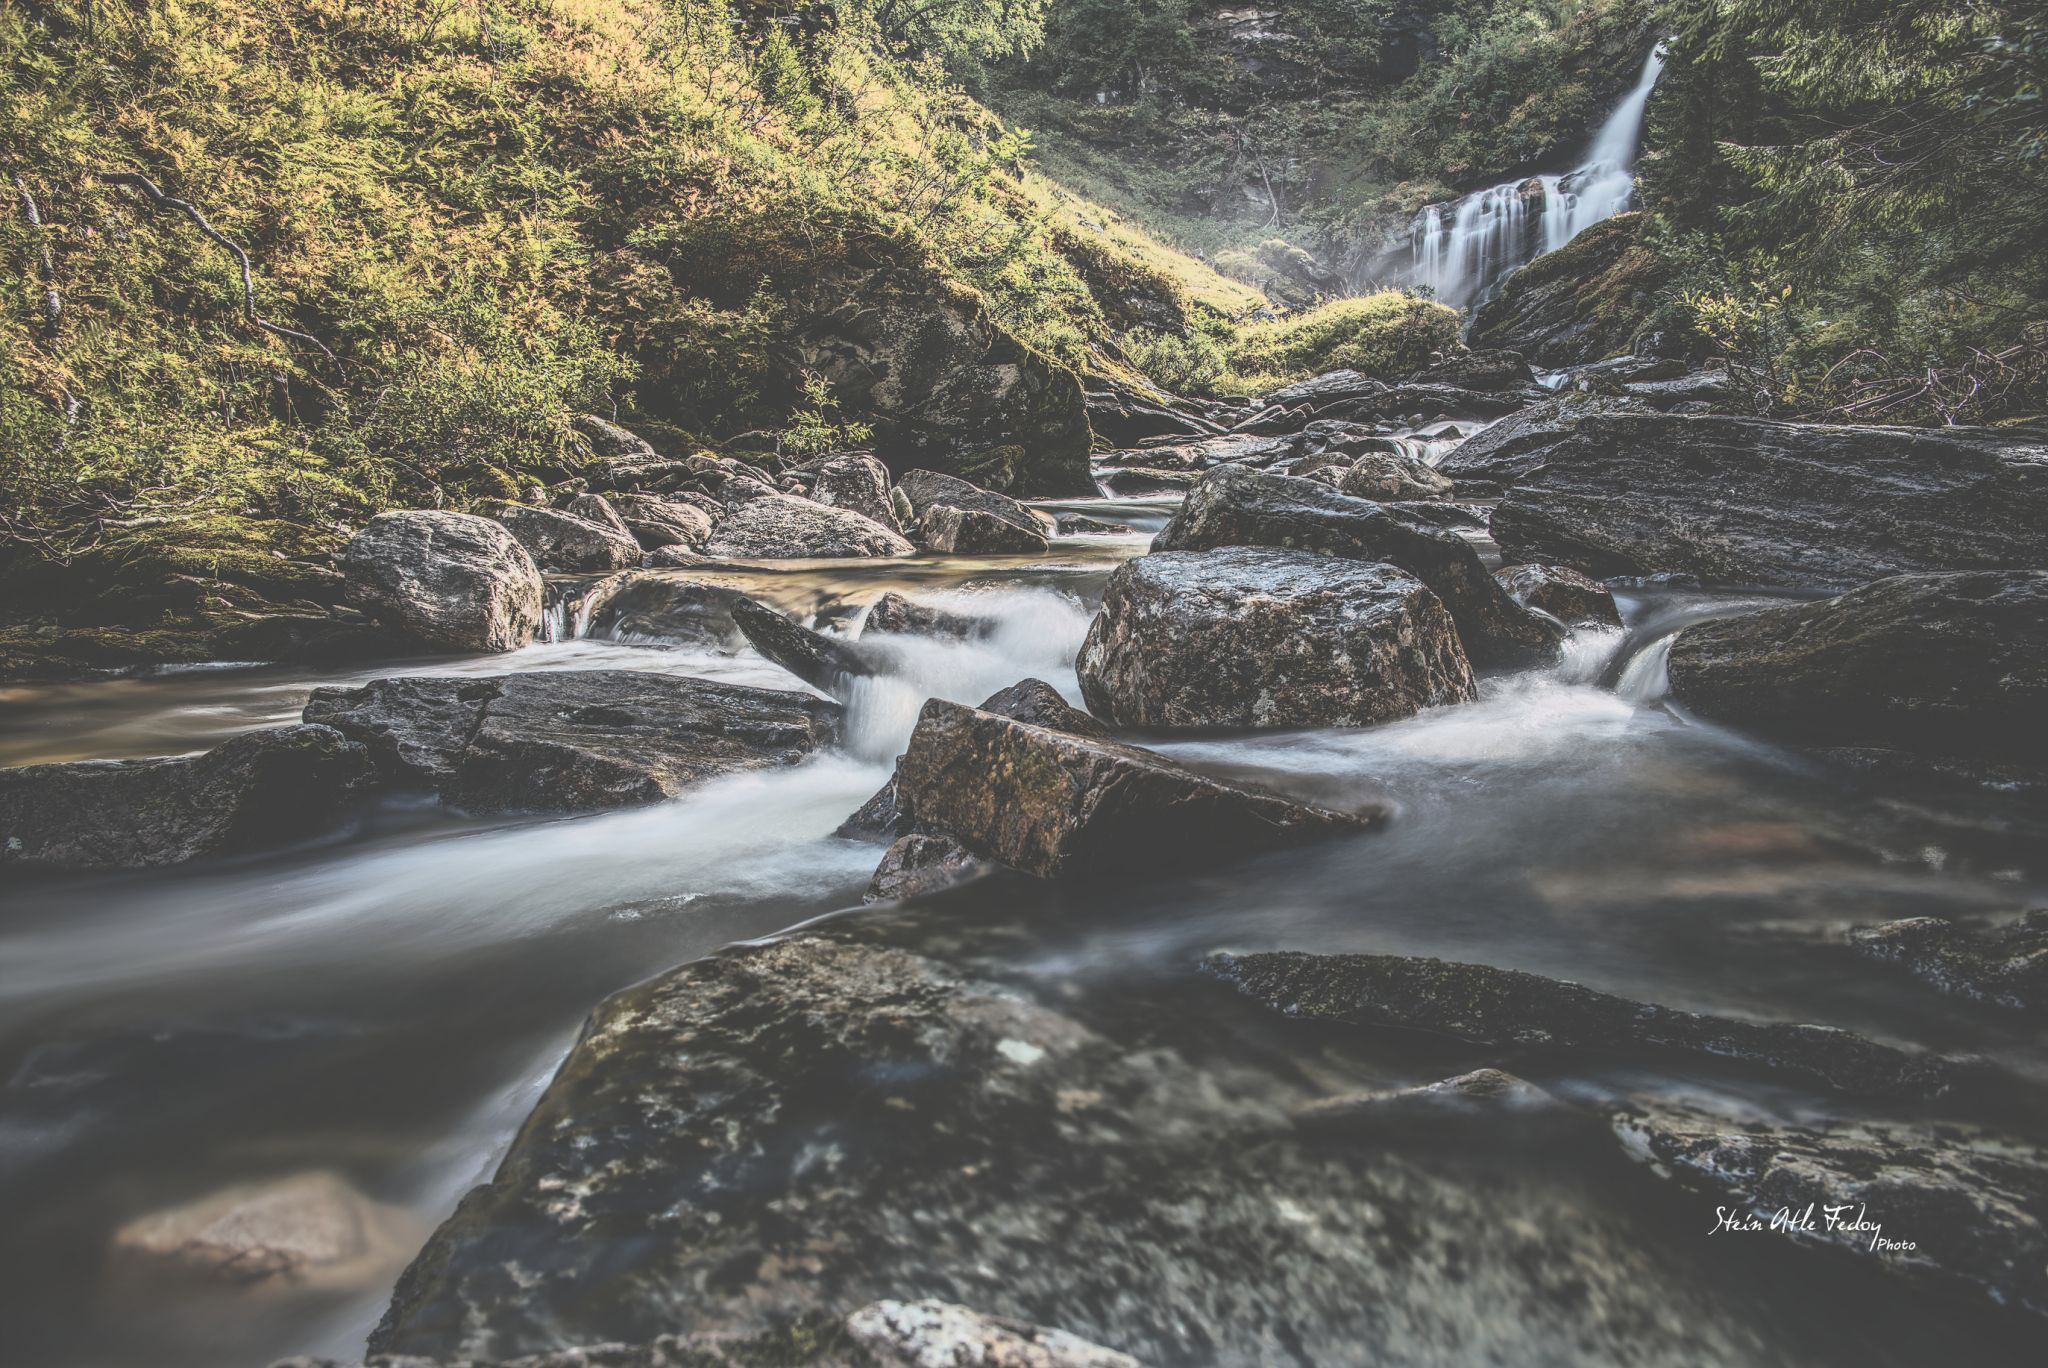 Brekkhus river, Norway